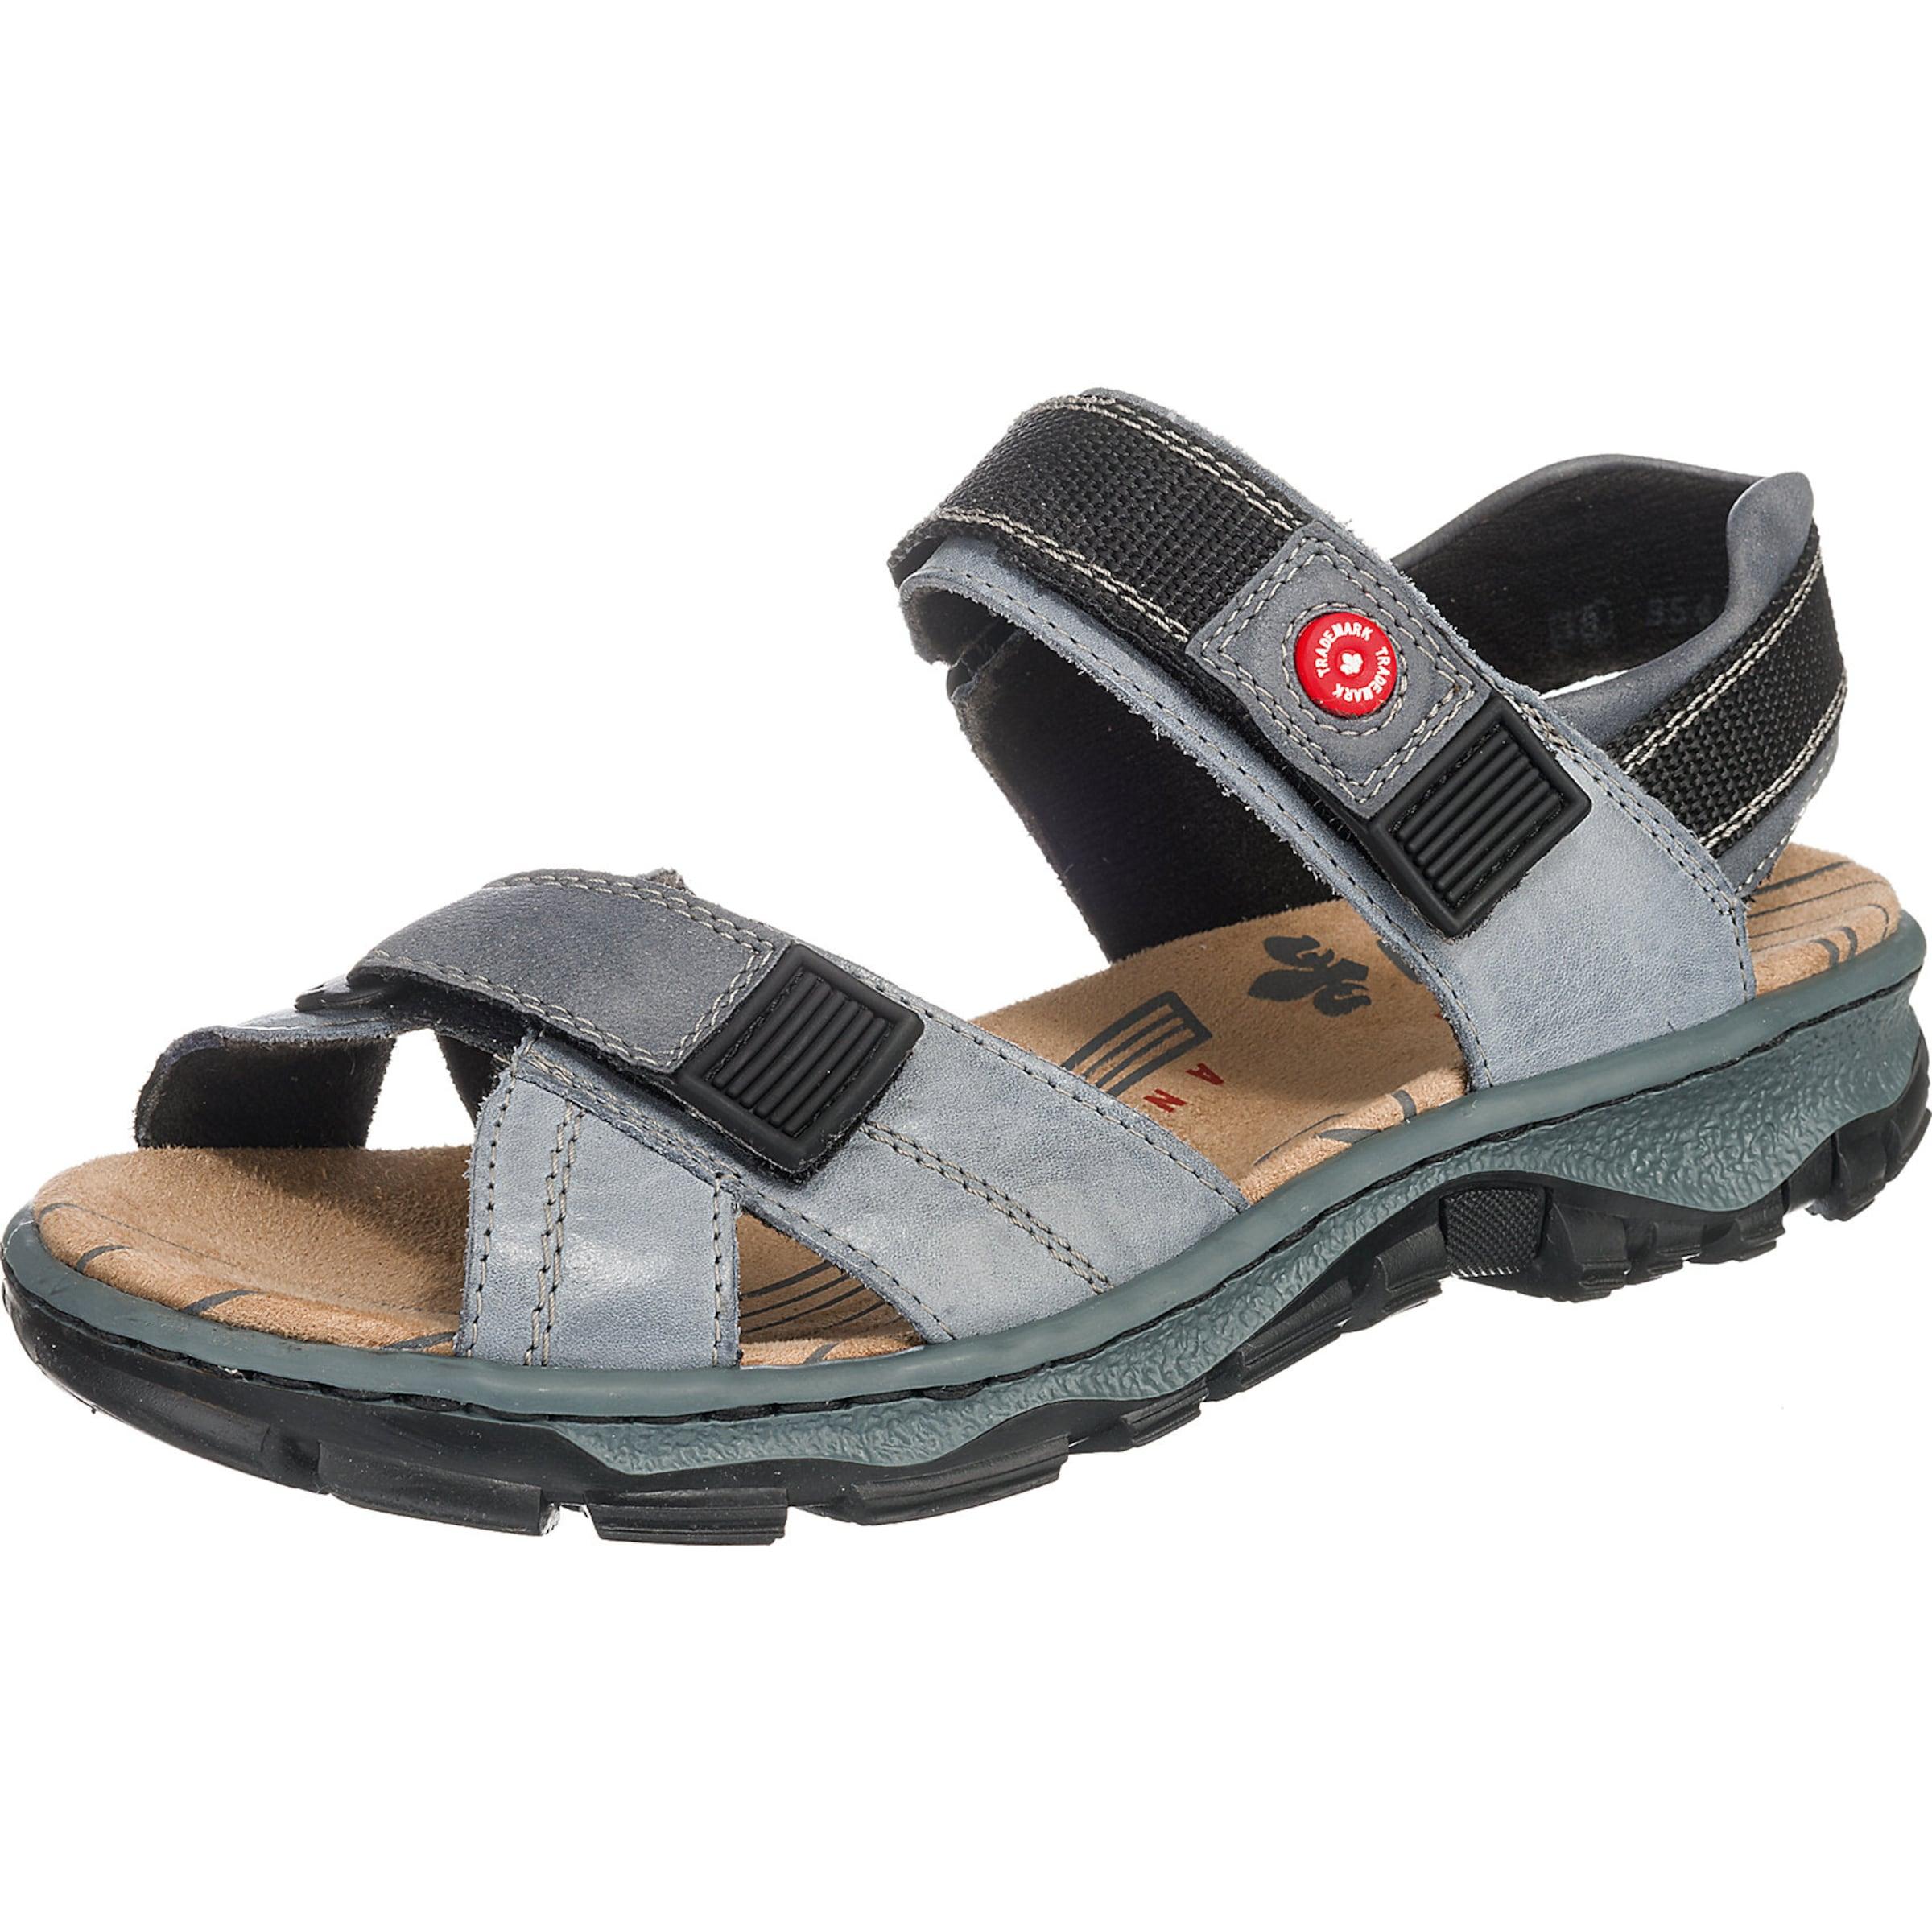 RIEKER Trekkingsandale Günstige und langlebige Schuhe